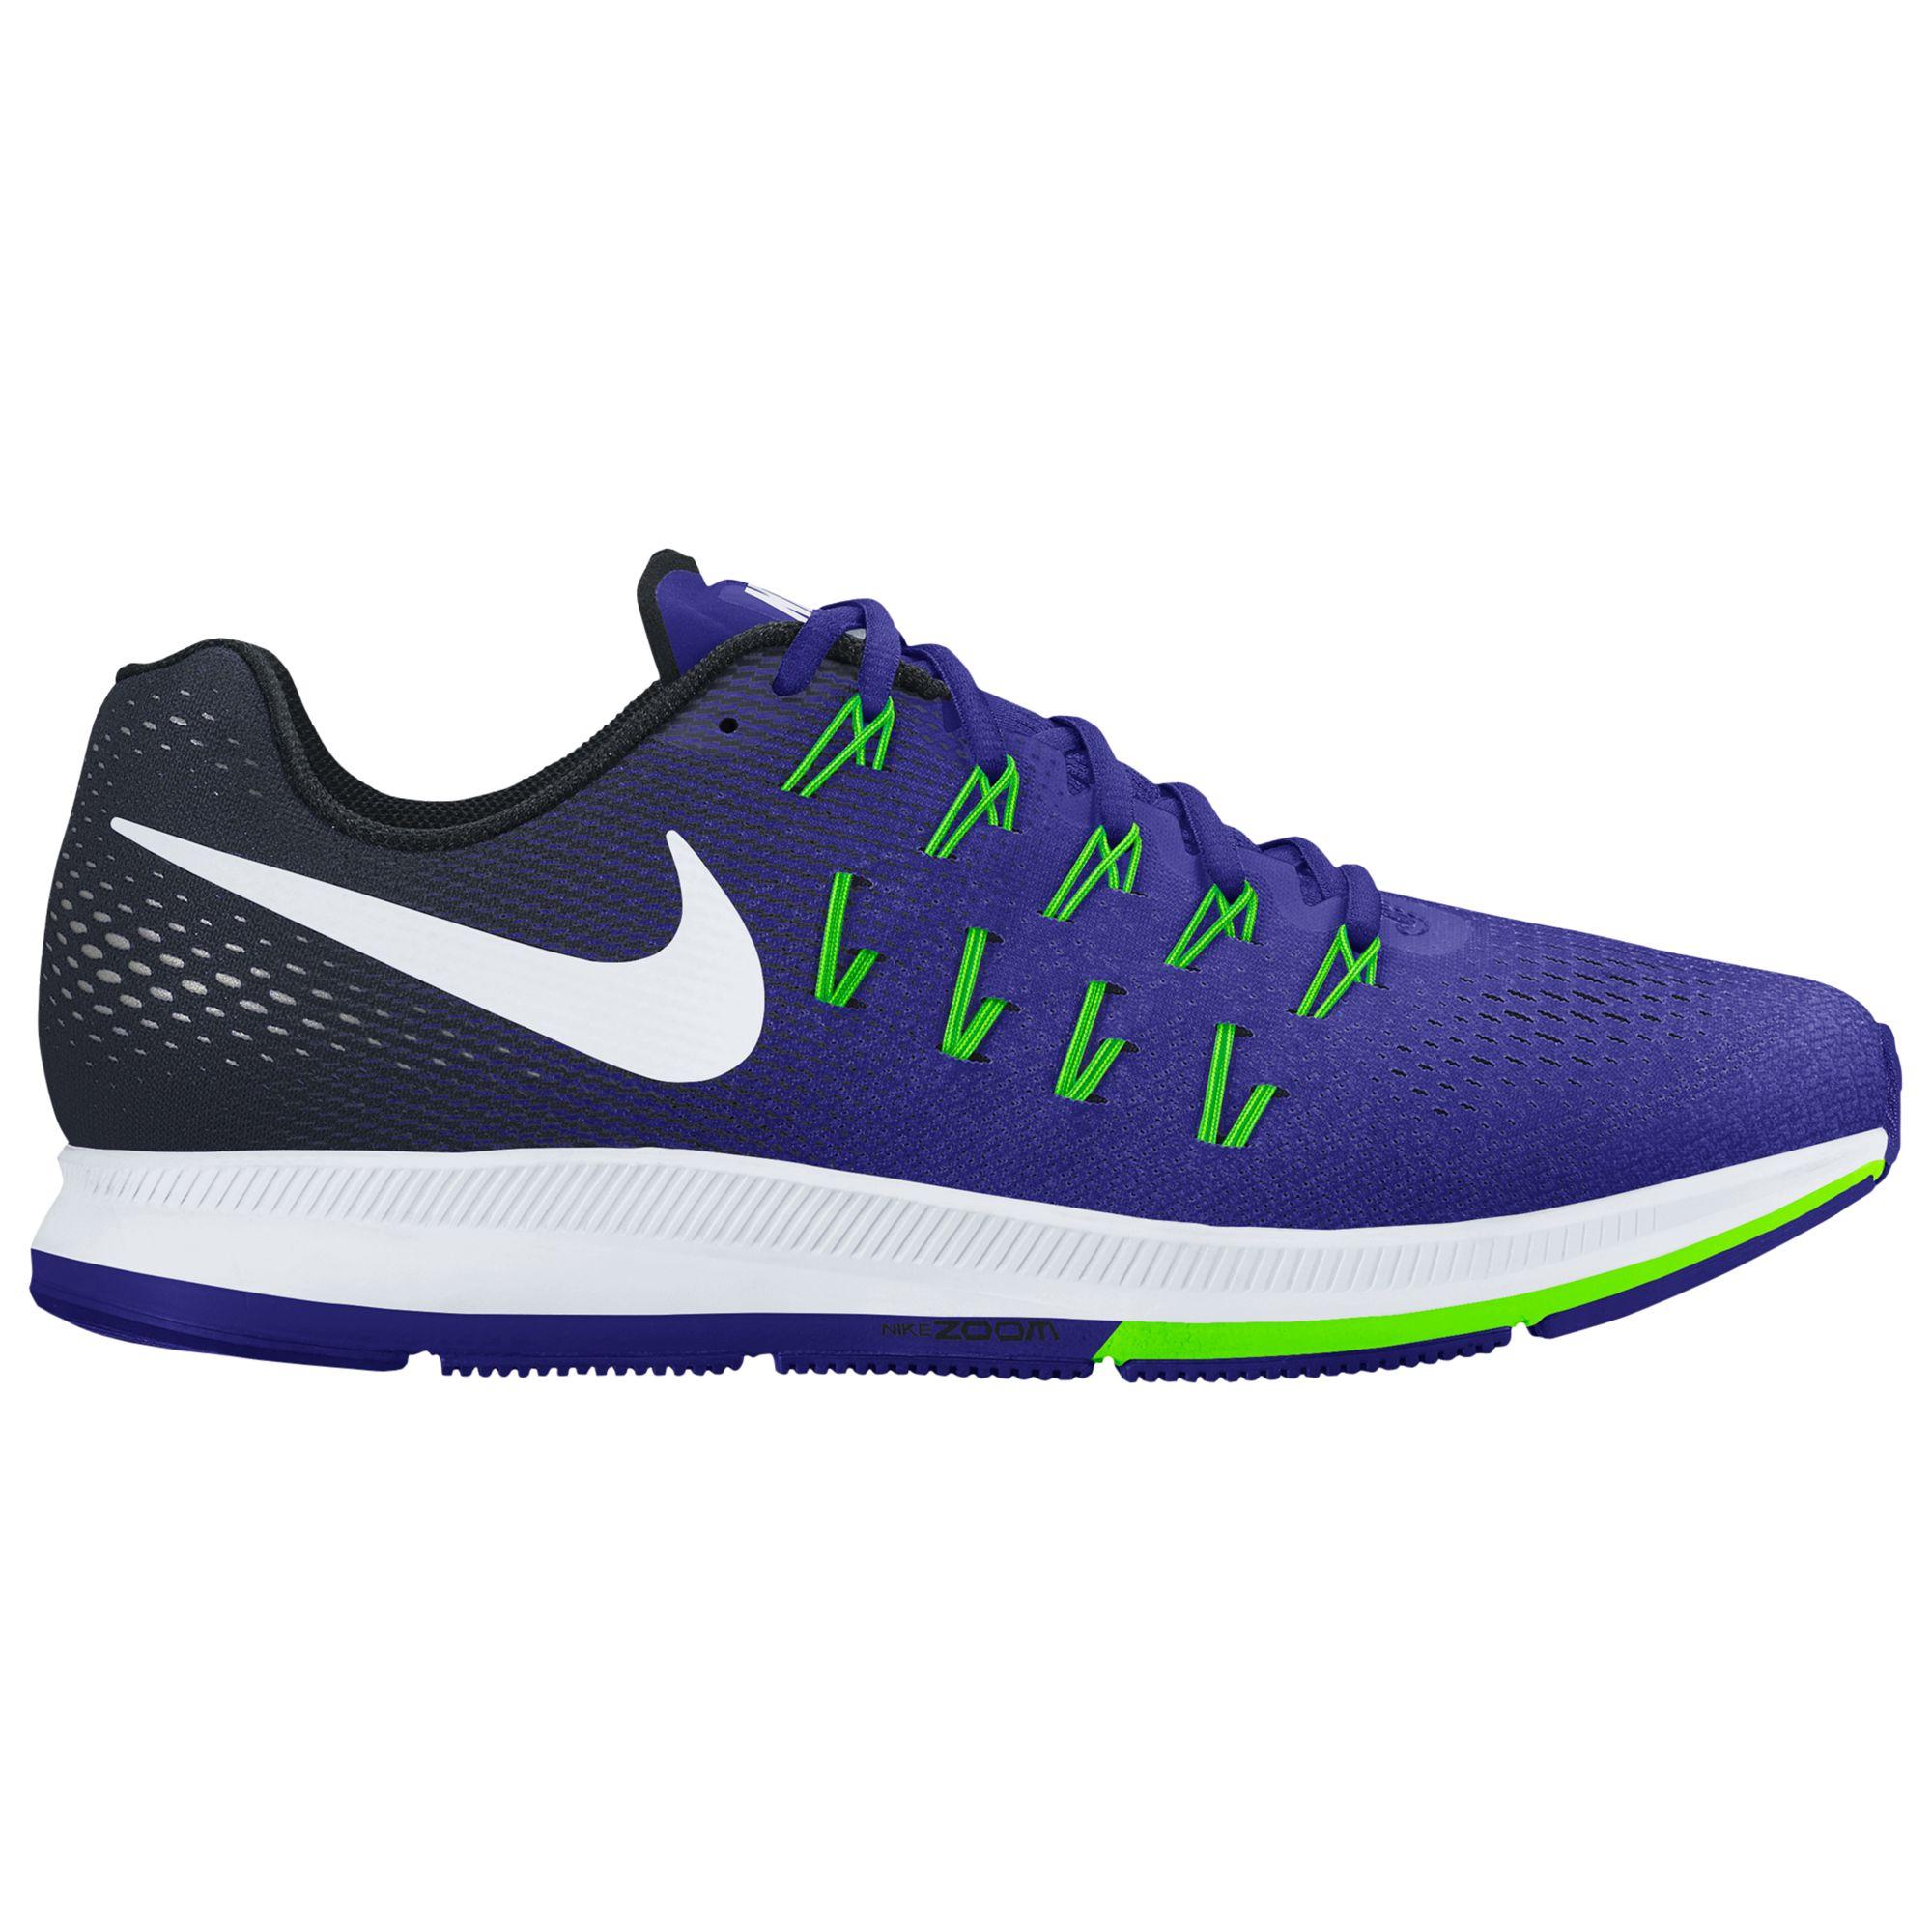 a0e390ec102 Nike Air Zoom Pegasus 33 Men s Running Shoes at John Lewis   Partners